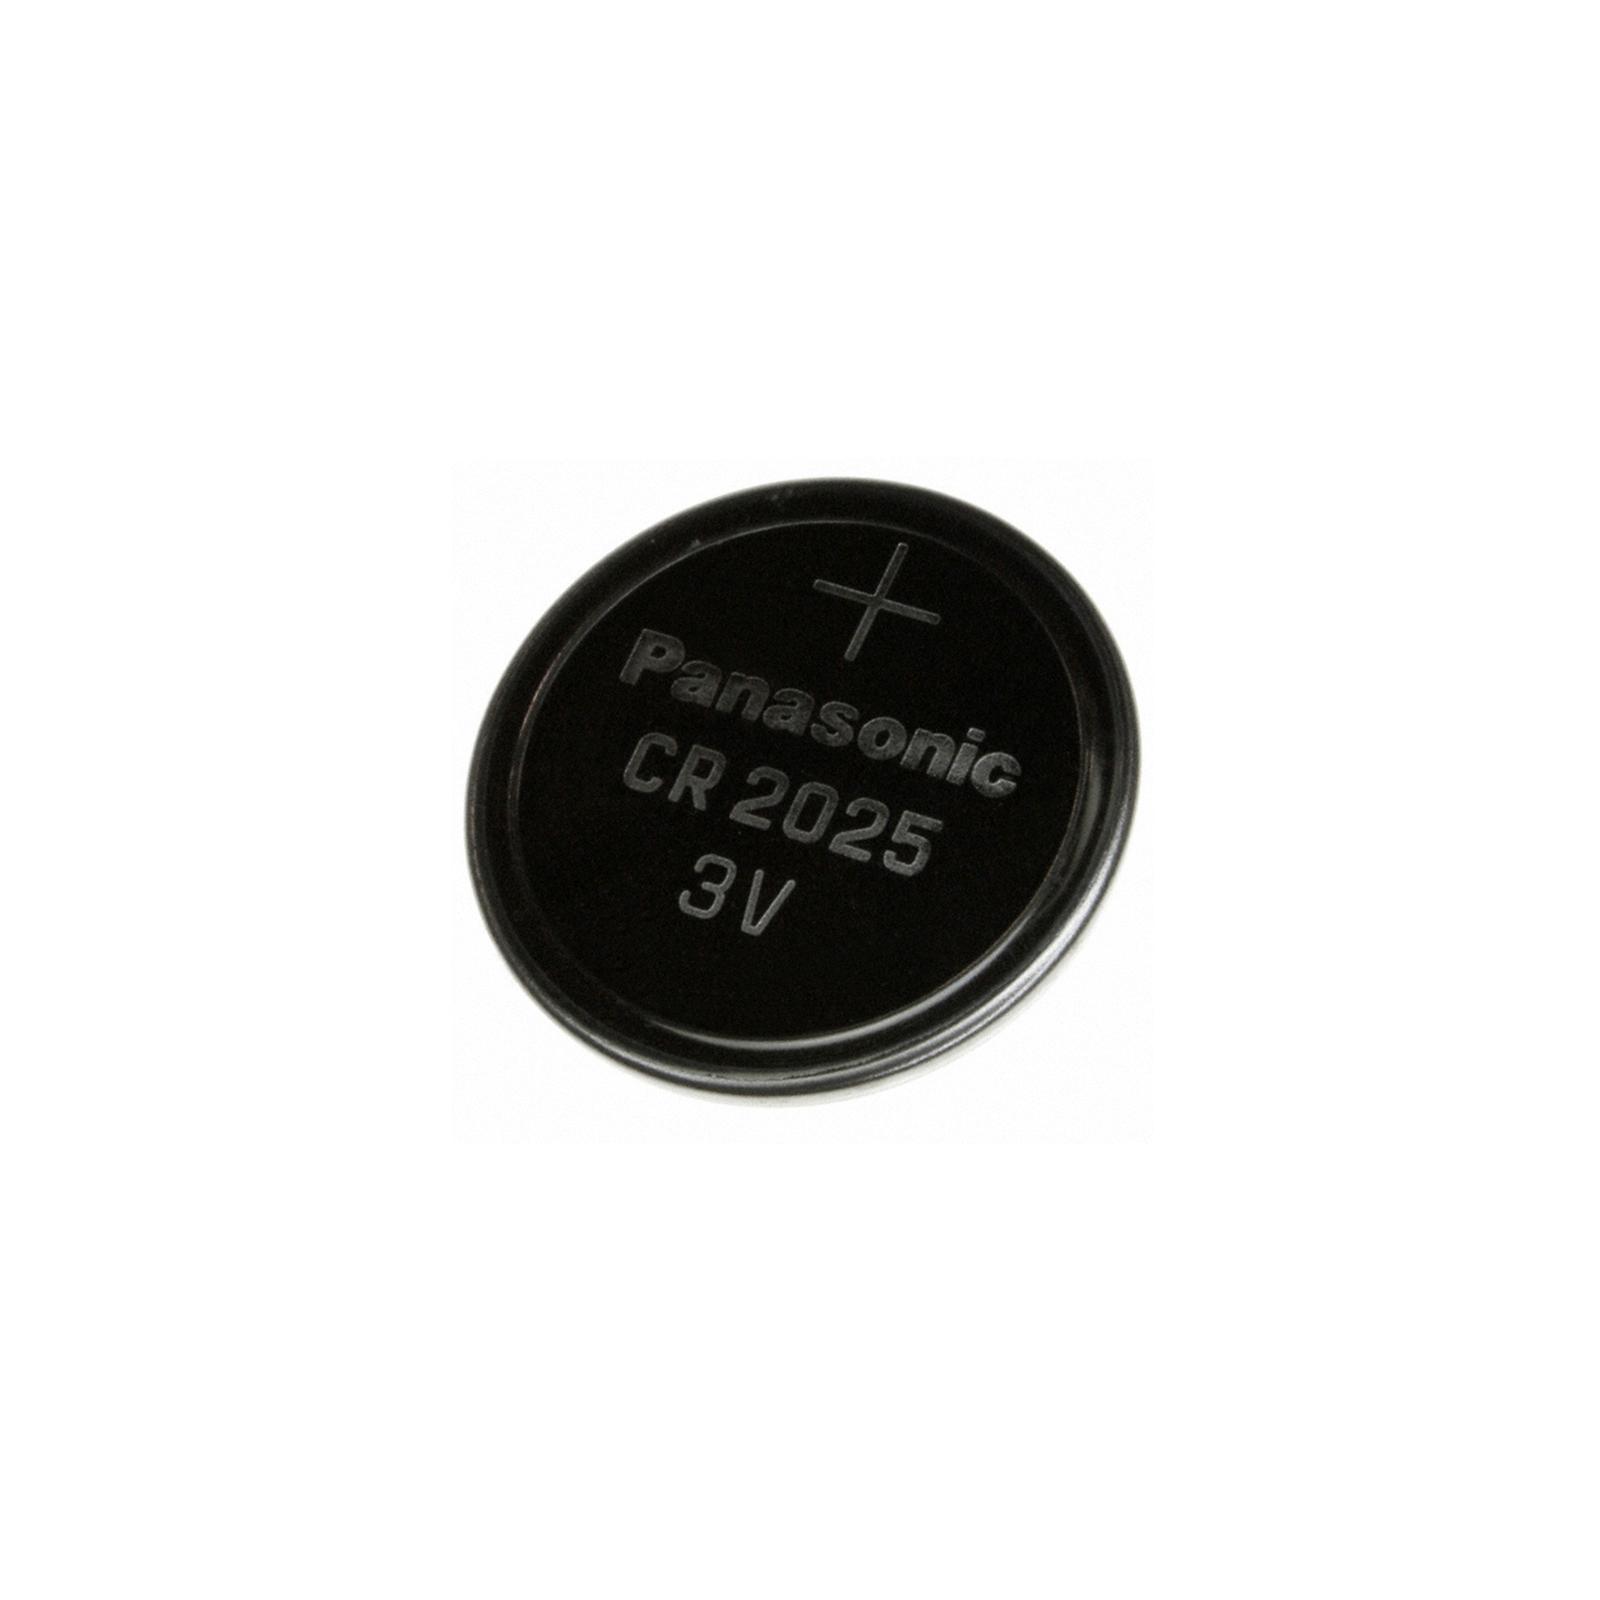 Cr2025 Battery Deals On 1001 Blocks